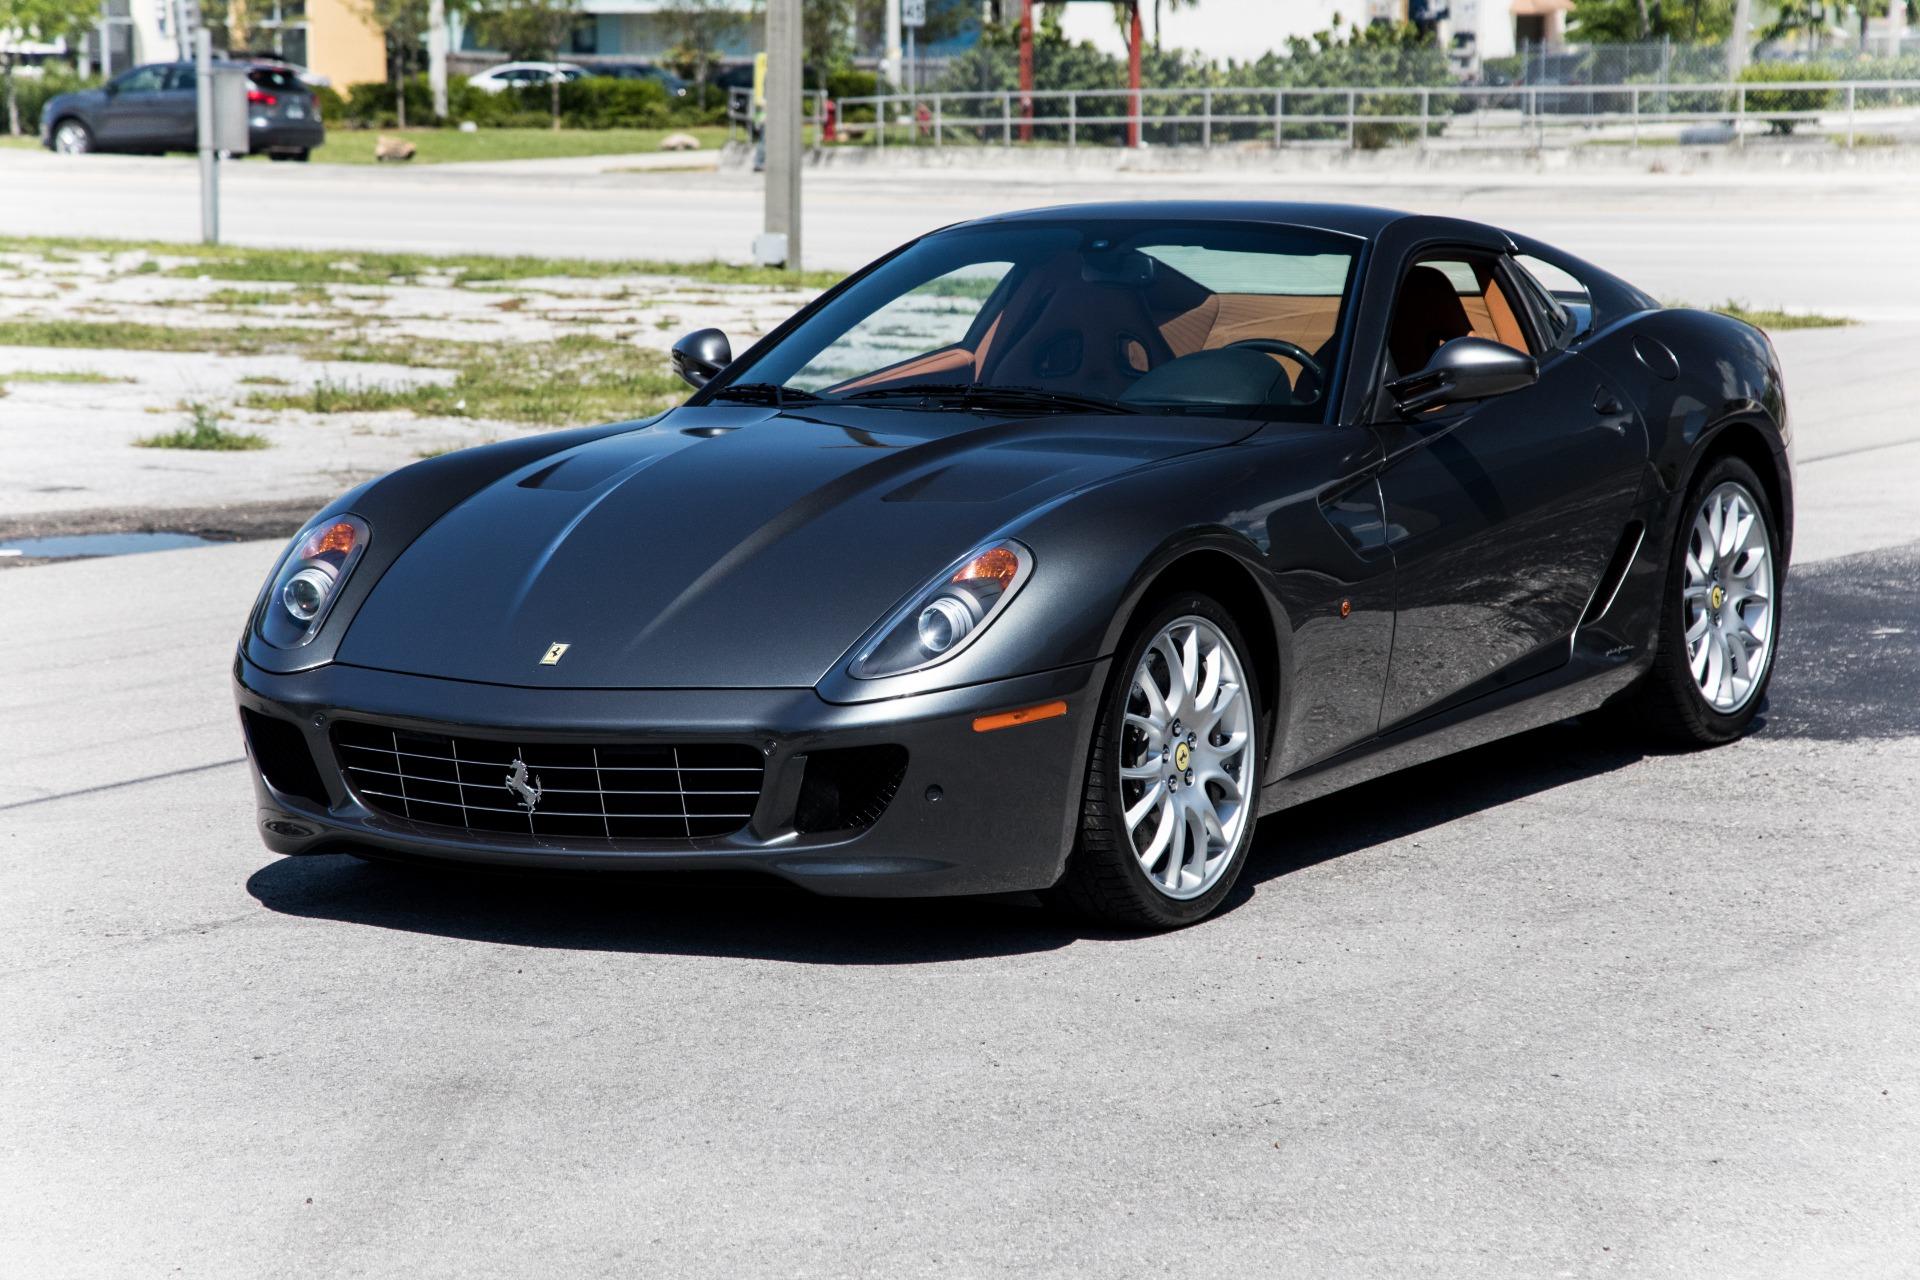 Used 2008 Ferrari 599 Gtb Fiorano Hgte For Sale 124 900 Marino Performance Motors Stock 157330